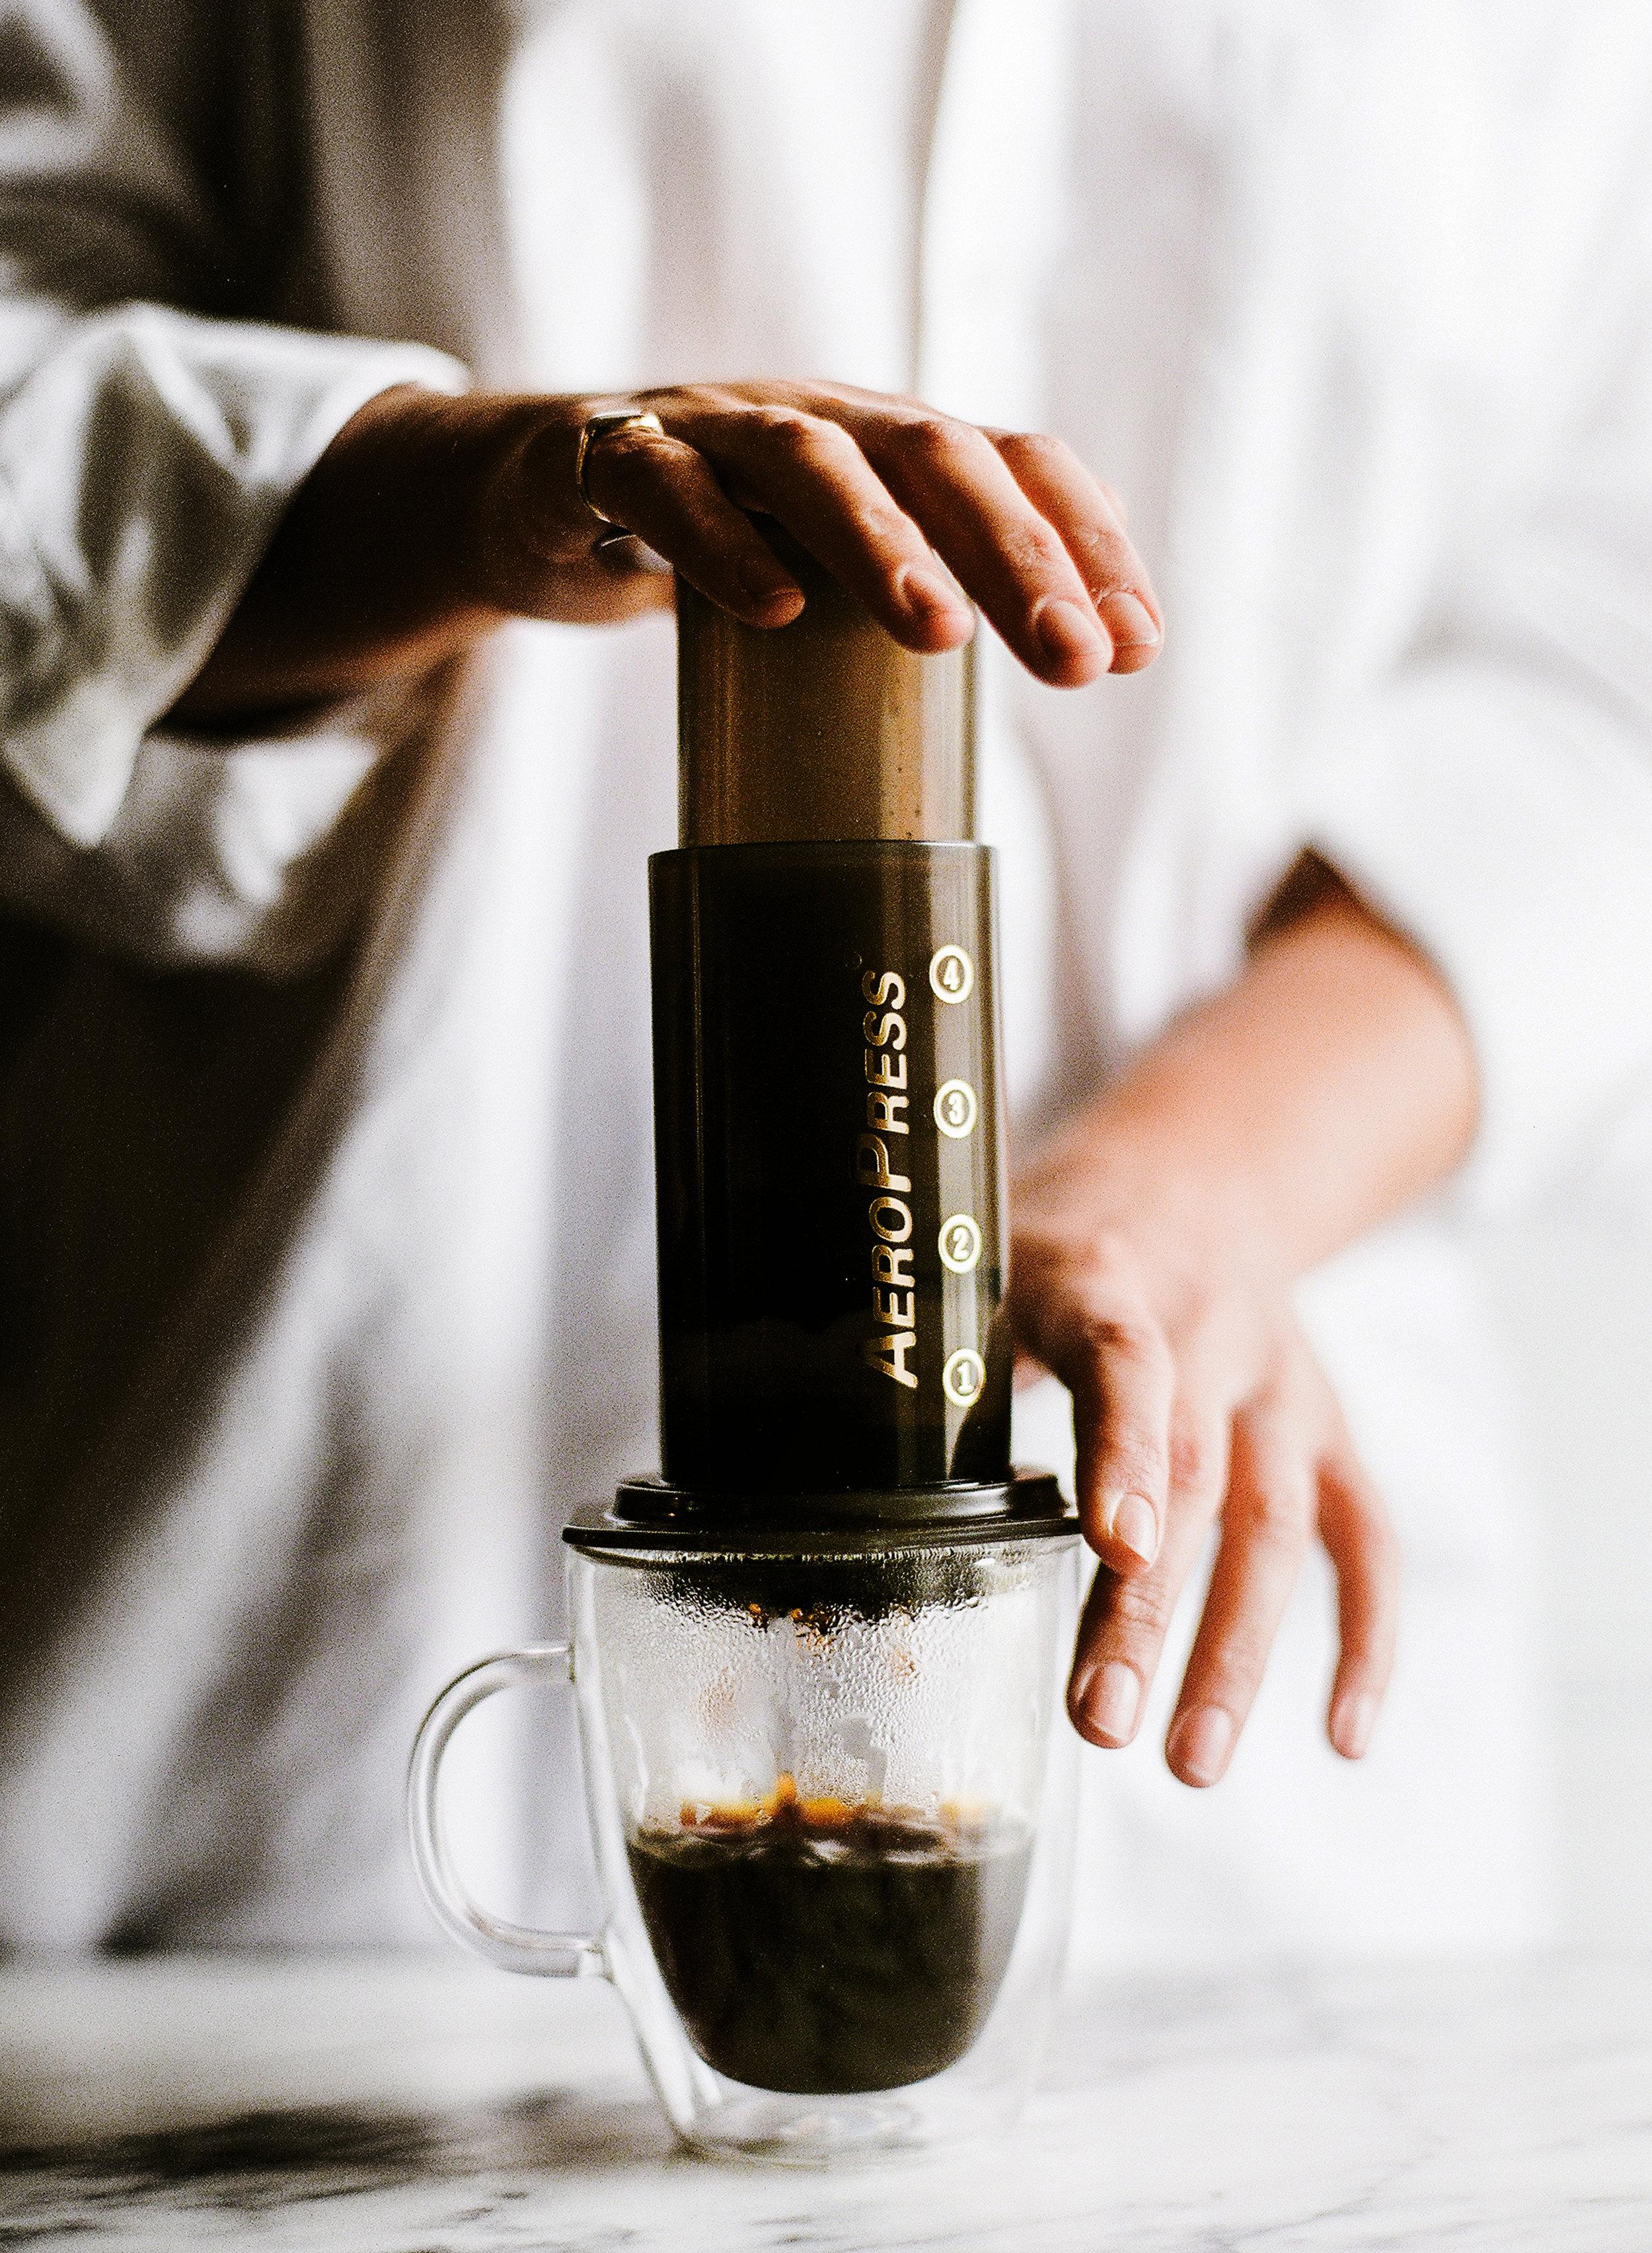 COFFEE0005.jpg